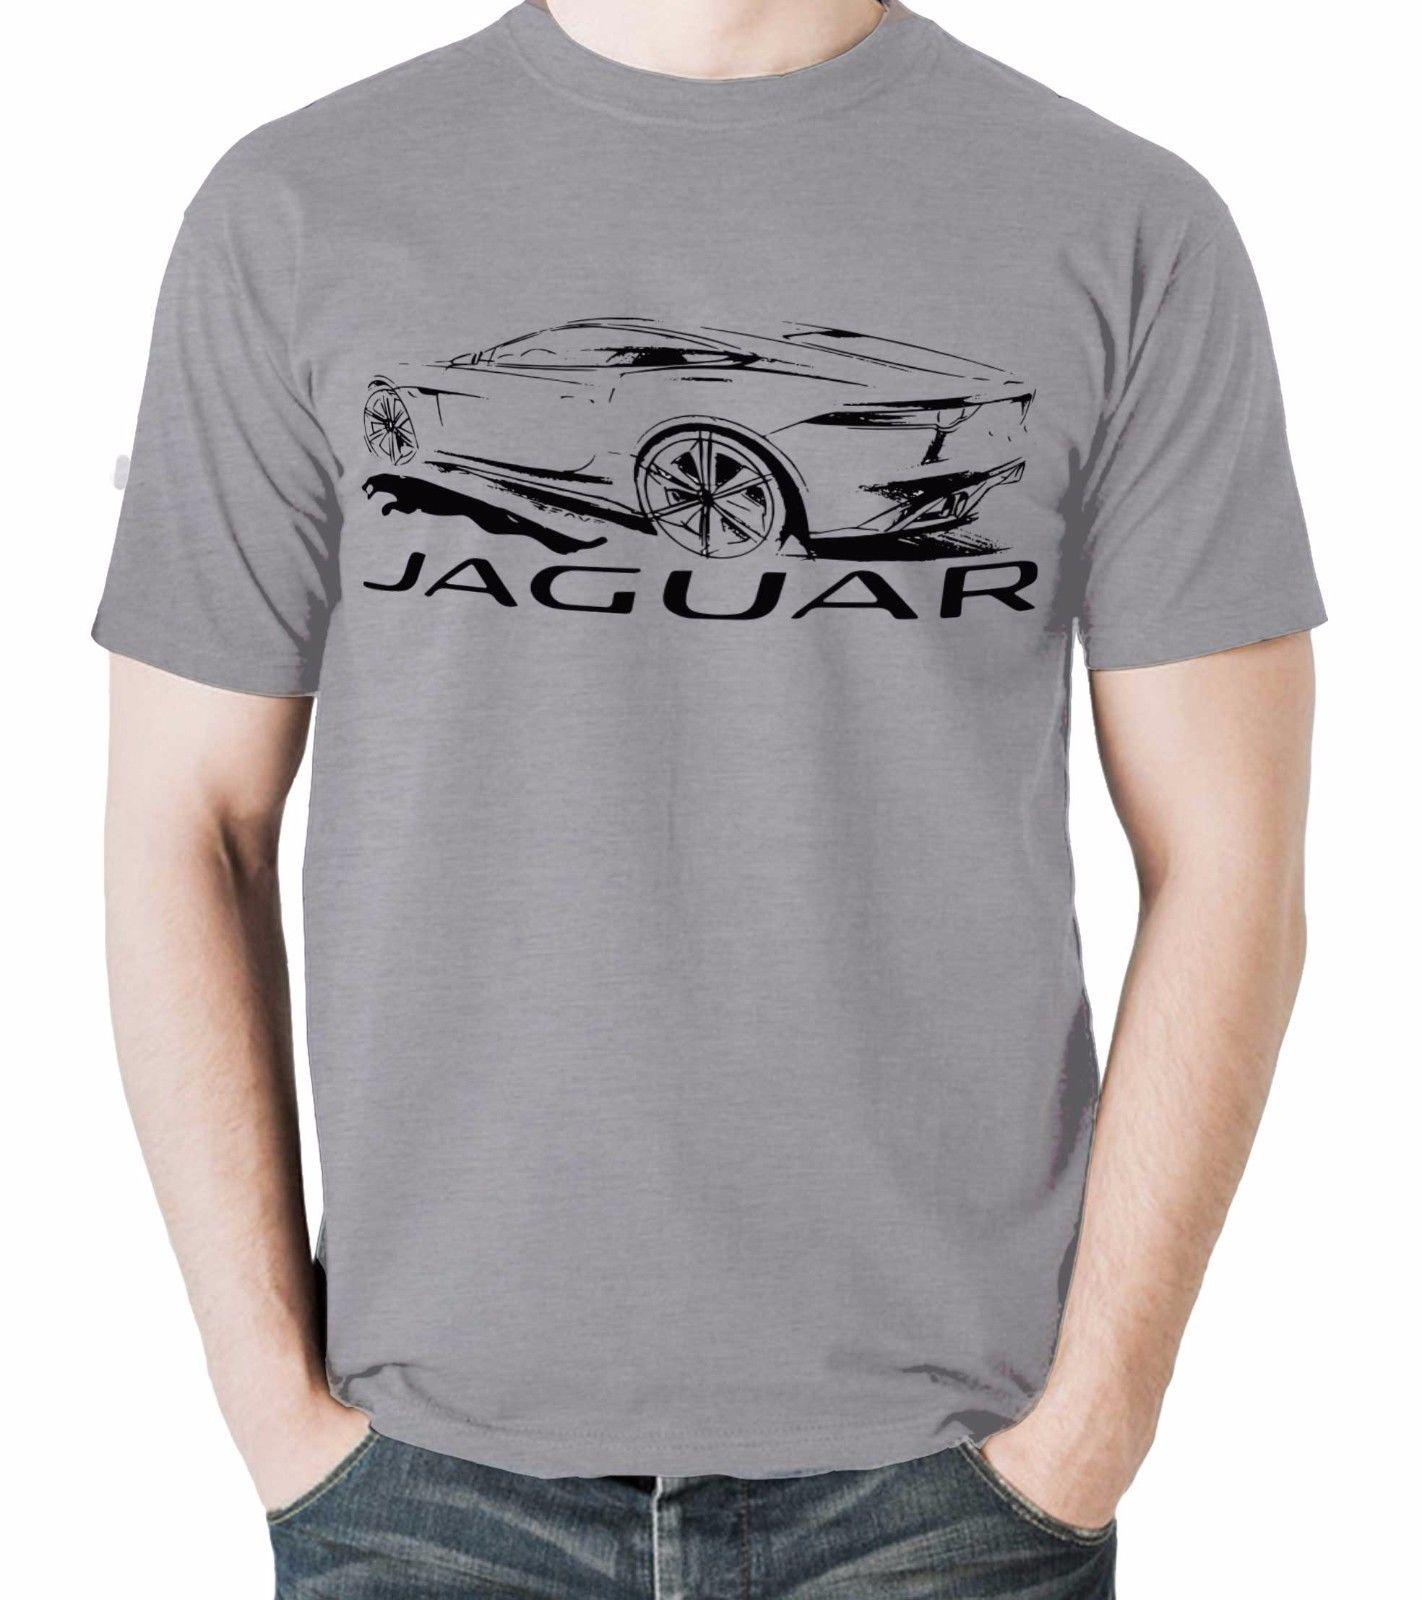 backstage soulland casa shirts shirt souland t jaguar psychose white products market